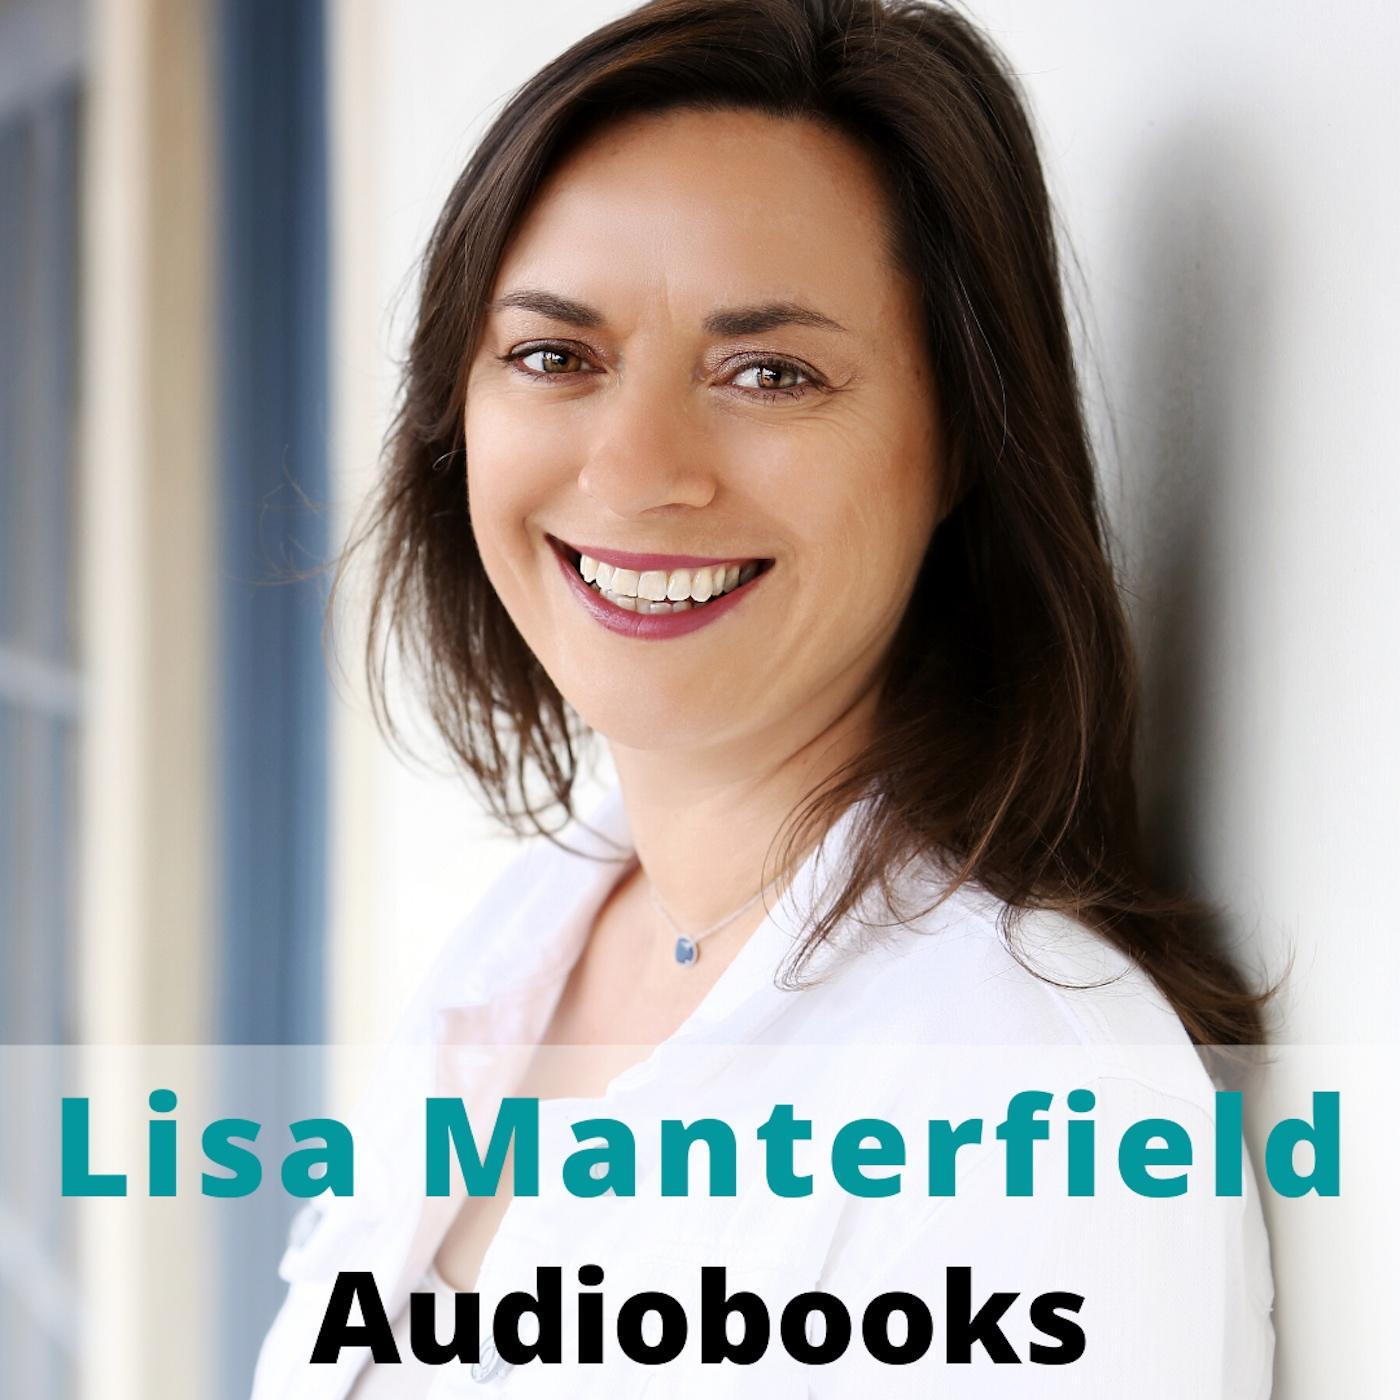 Lisa Manterfield Audiobooks show art